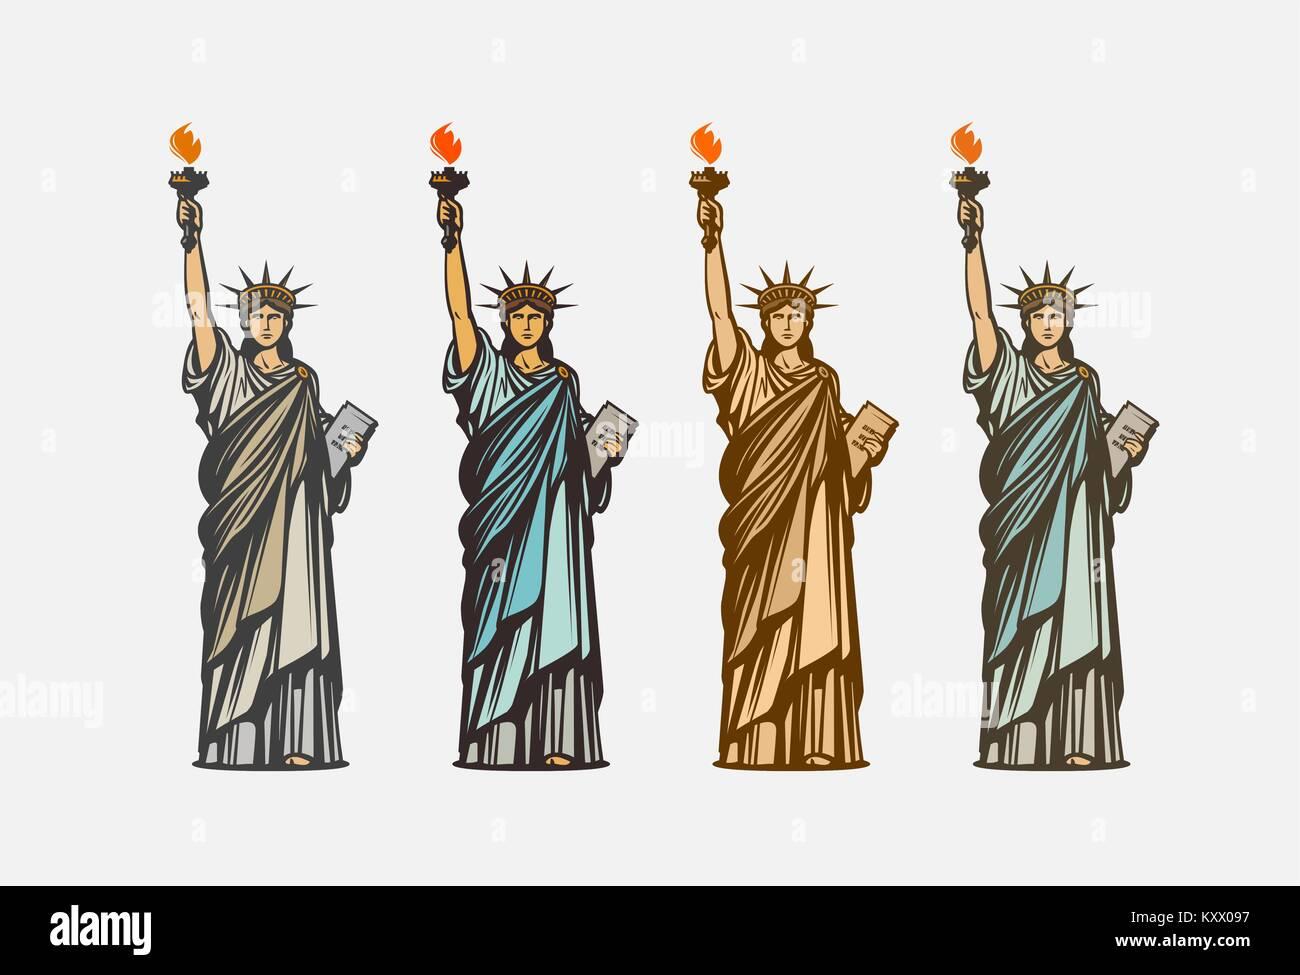 Statue Liberty Crown Cartoon Icon Stockfotos & Statue Liberty Crown ...